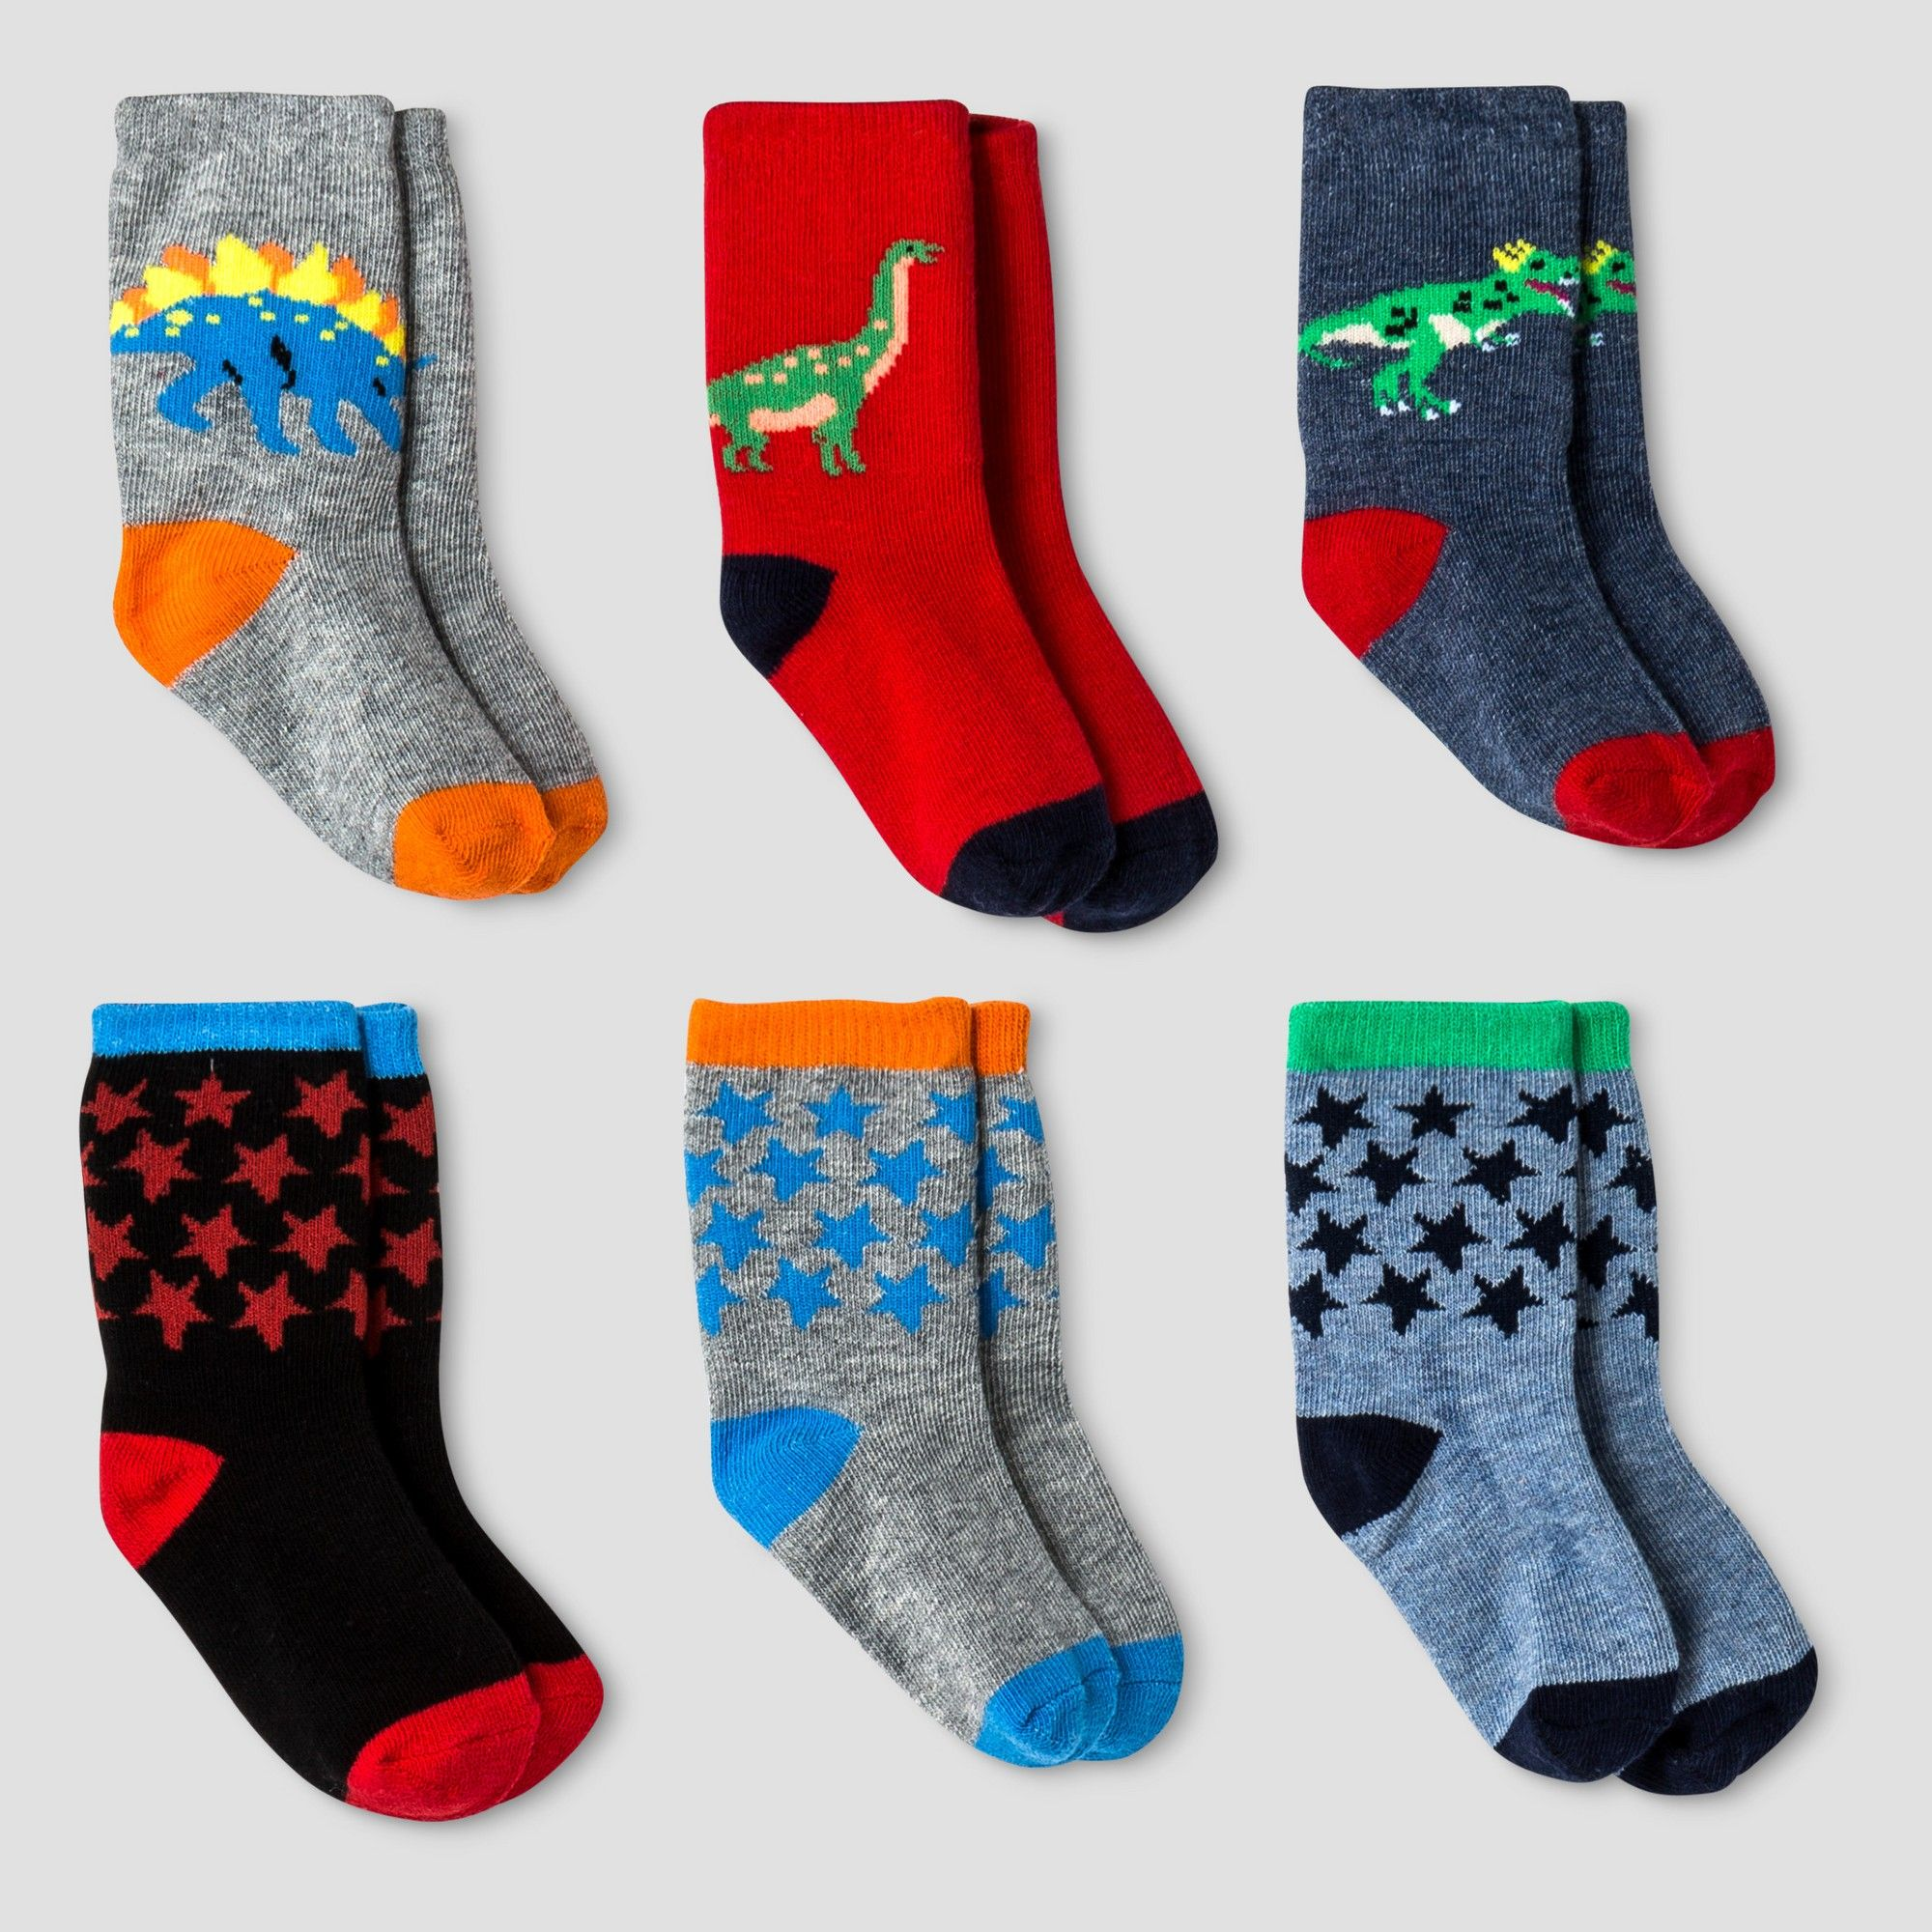 Baby Boys Crew Dress Socks 6pk Cat & Jack Navy 12 24M Blue